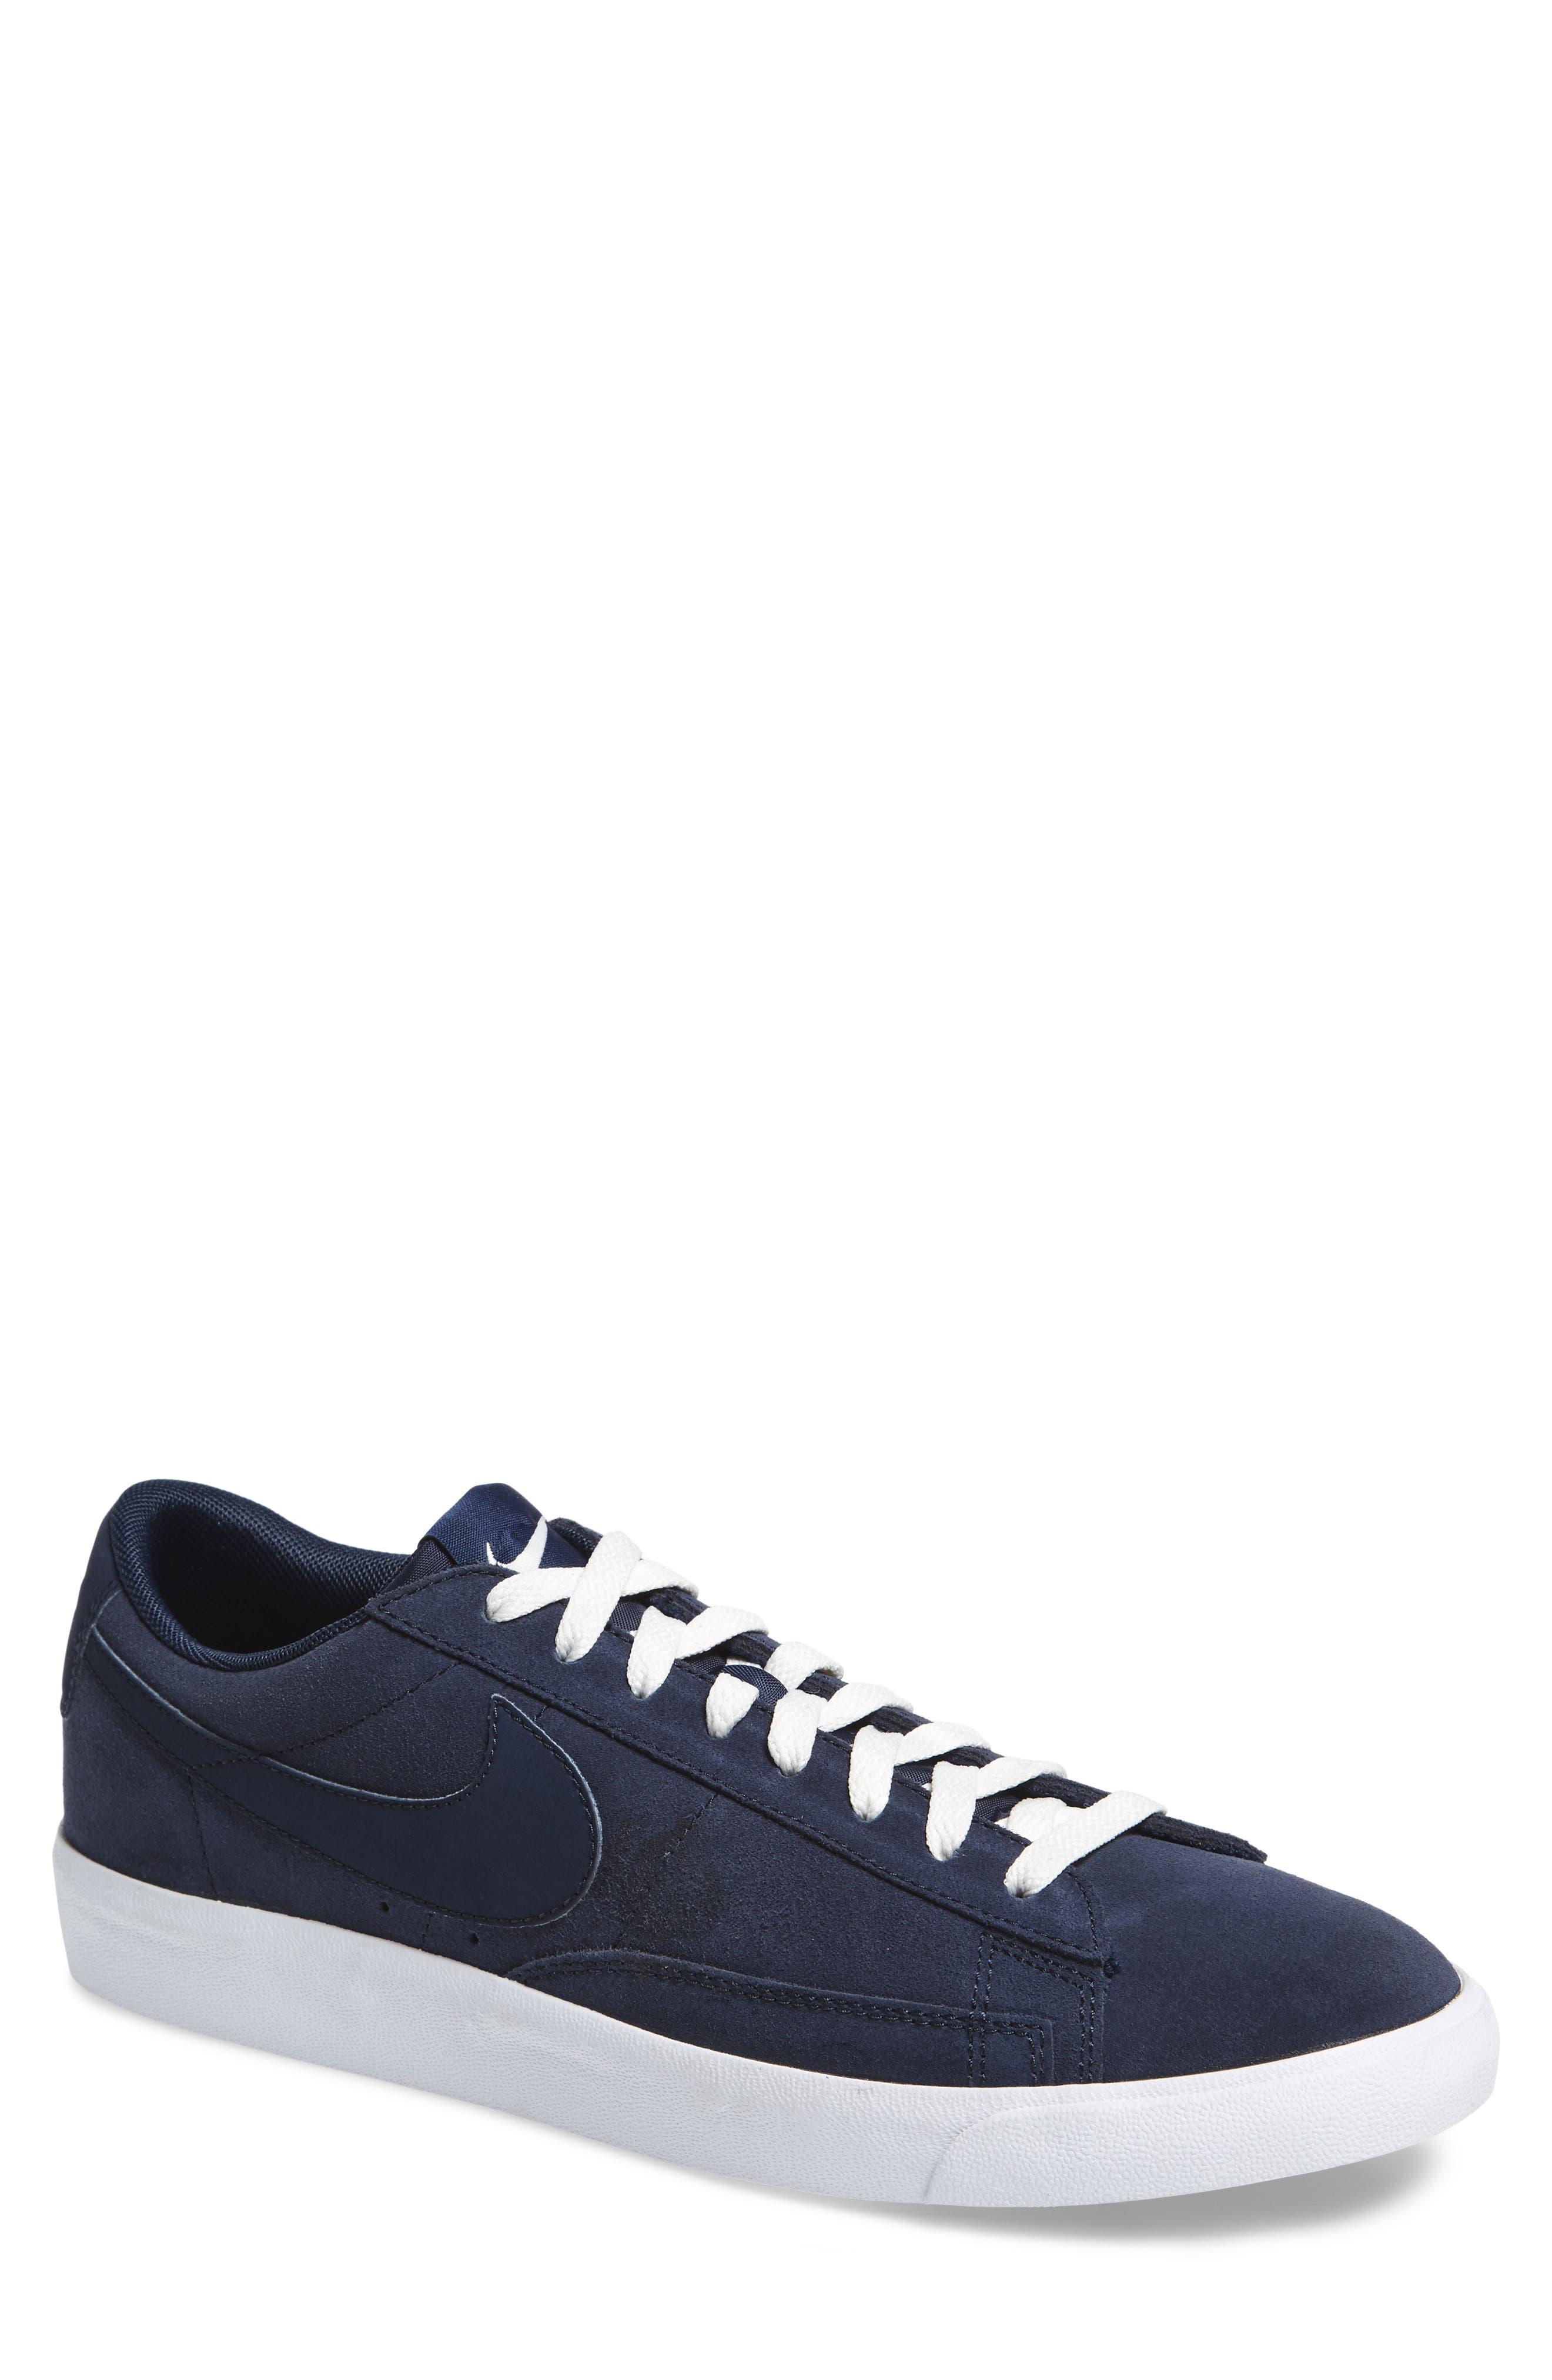 Blazer Low Suede Sneaker,                         Main,                         color, Obsidian/ Sail/ Brown